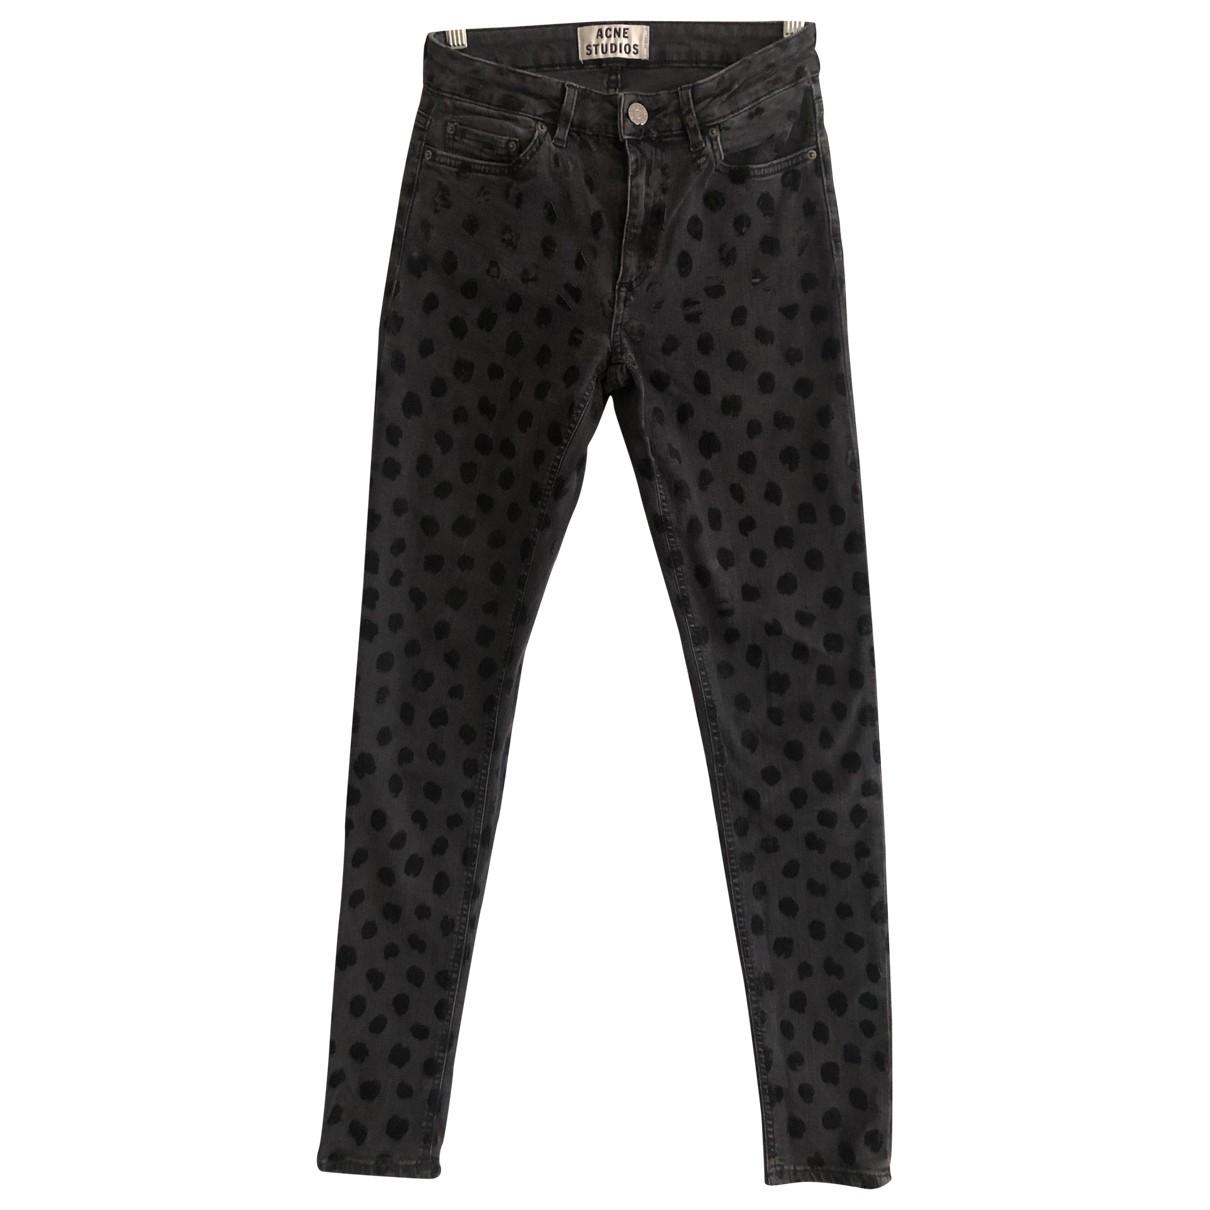 Acne Studios Skin 5 Grey Cotton - elasthane Jeans for Women 27 US